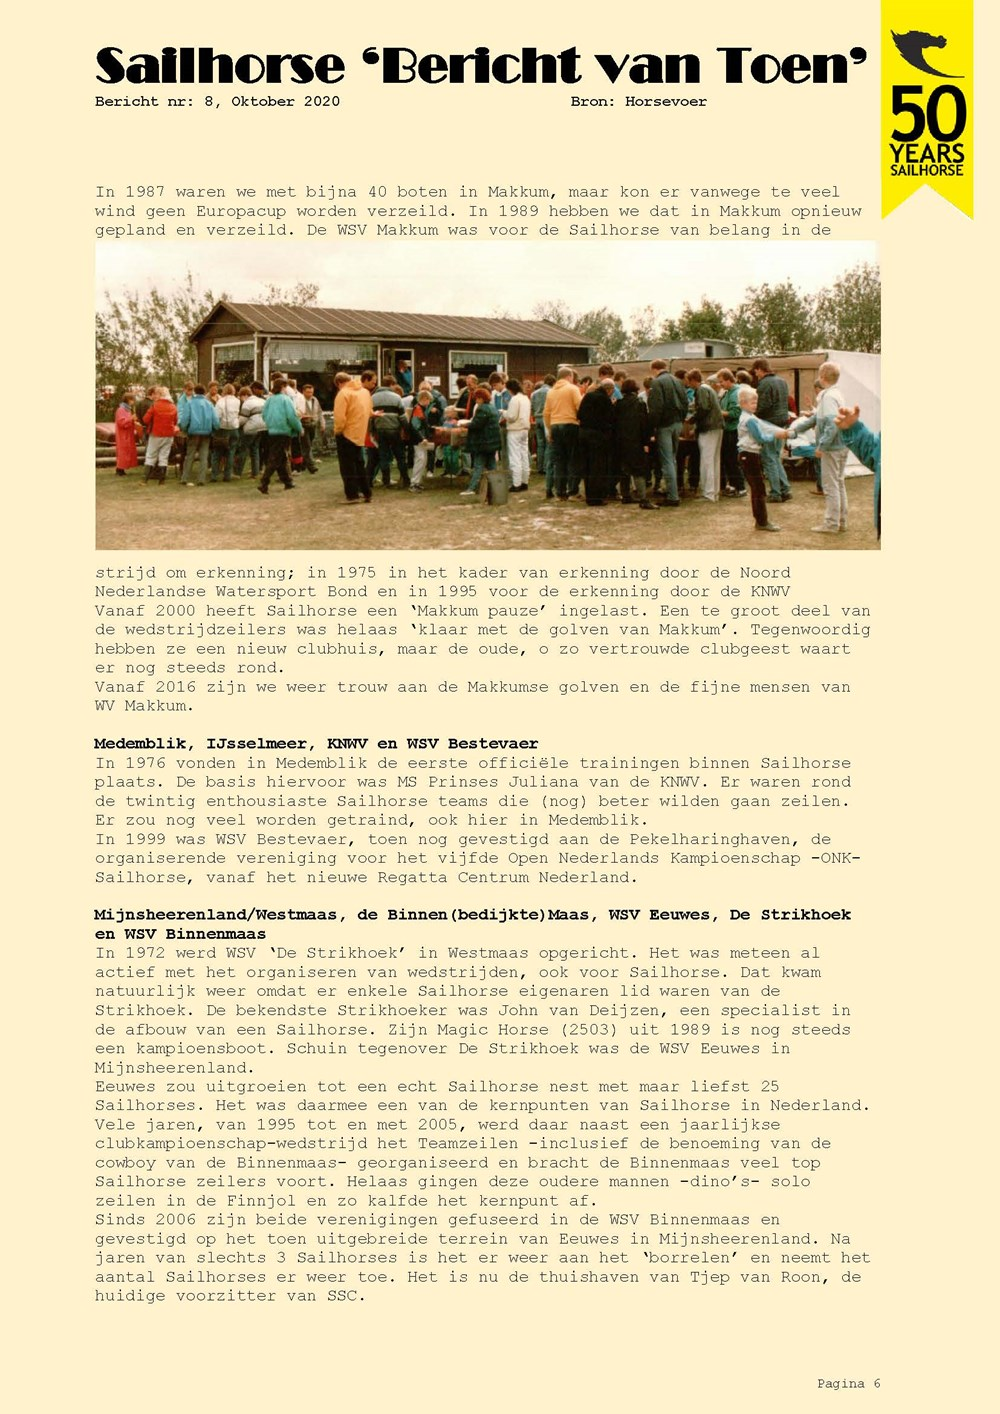 BvT8_Page_06.jpg